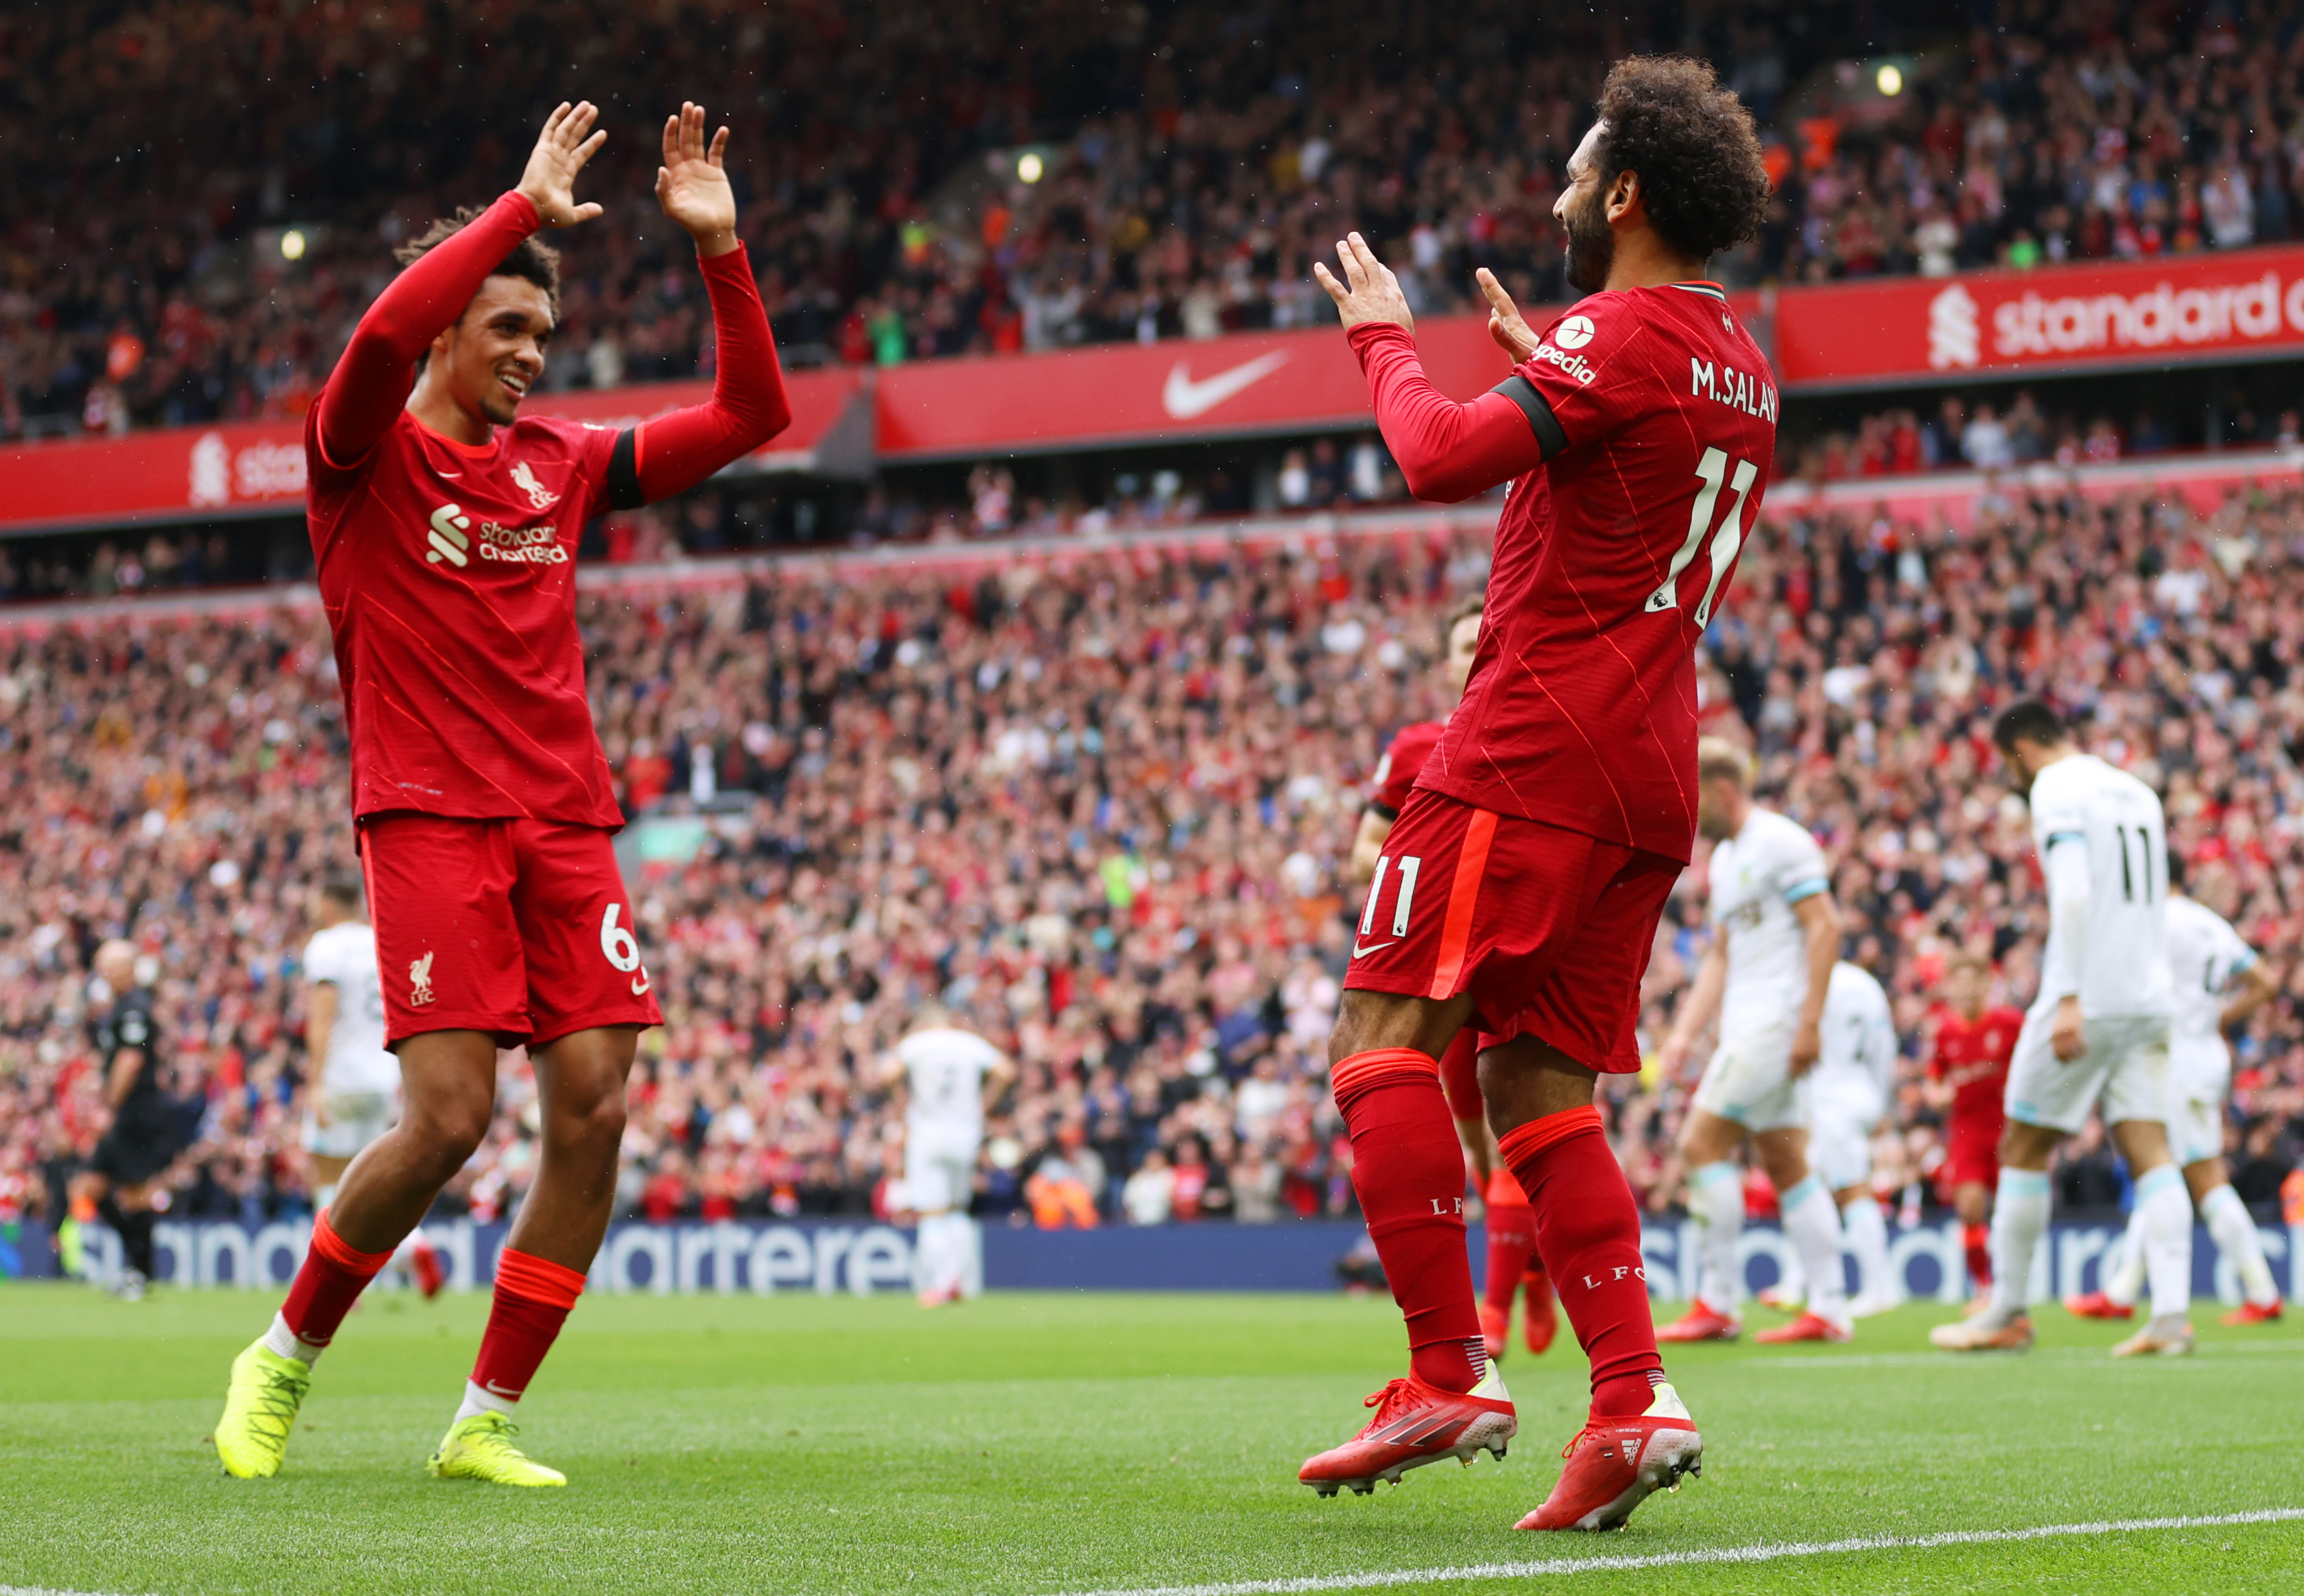 Mohamed Salah celebrates a goal with Trent Alexander-Arnold - Liverpool - Premier League